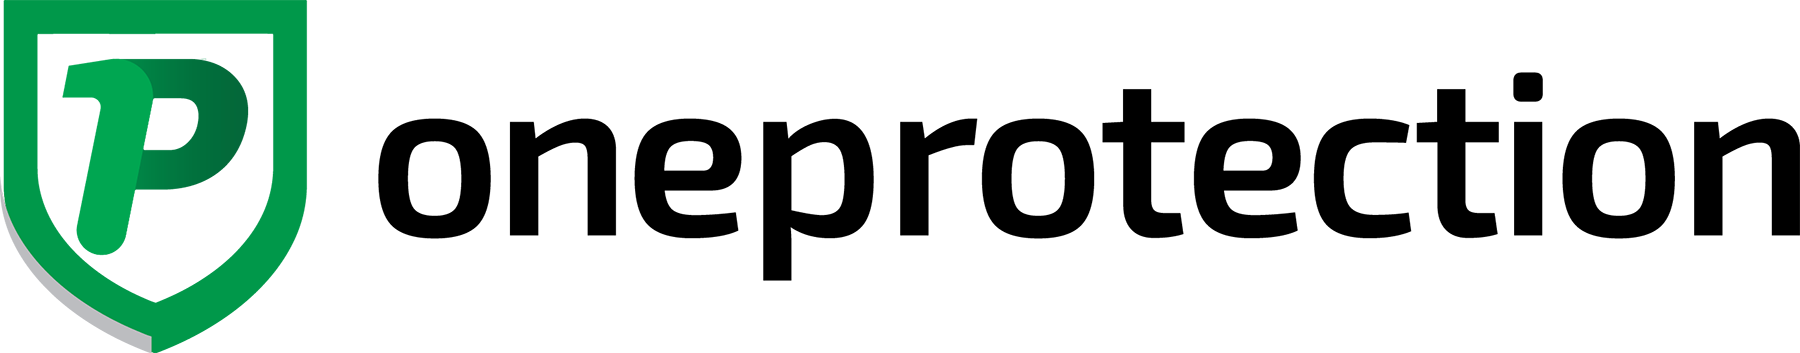 logo-grande